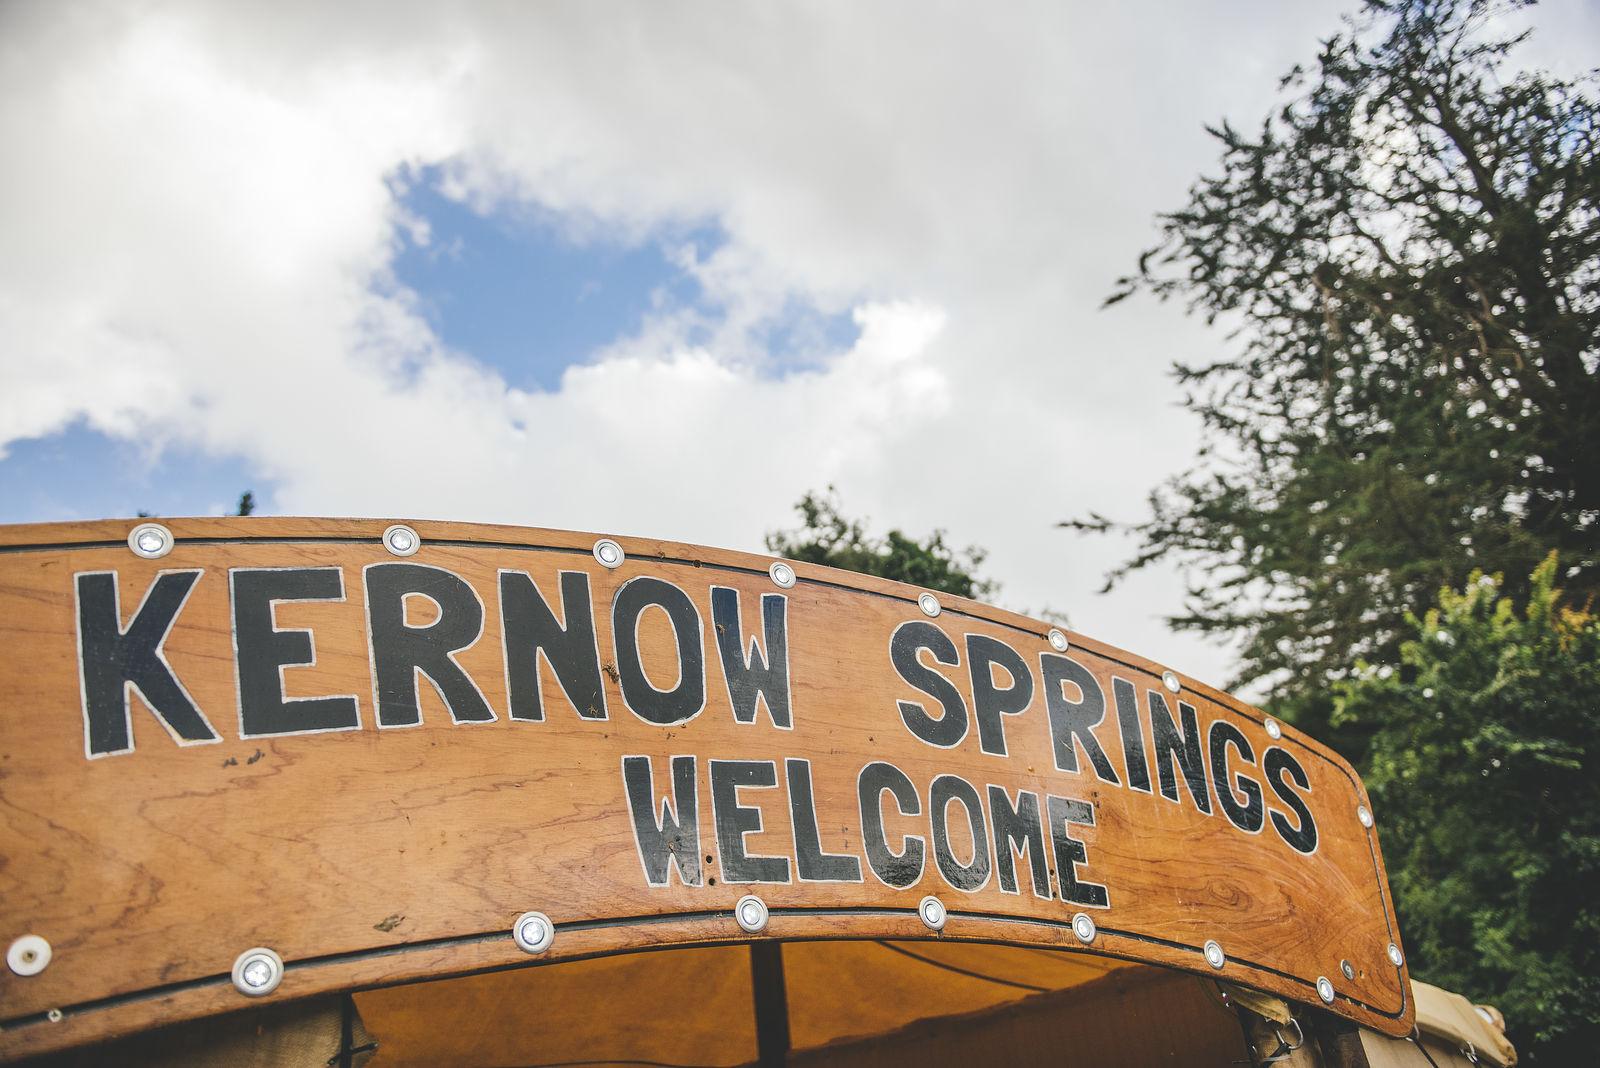 Kernow Springs